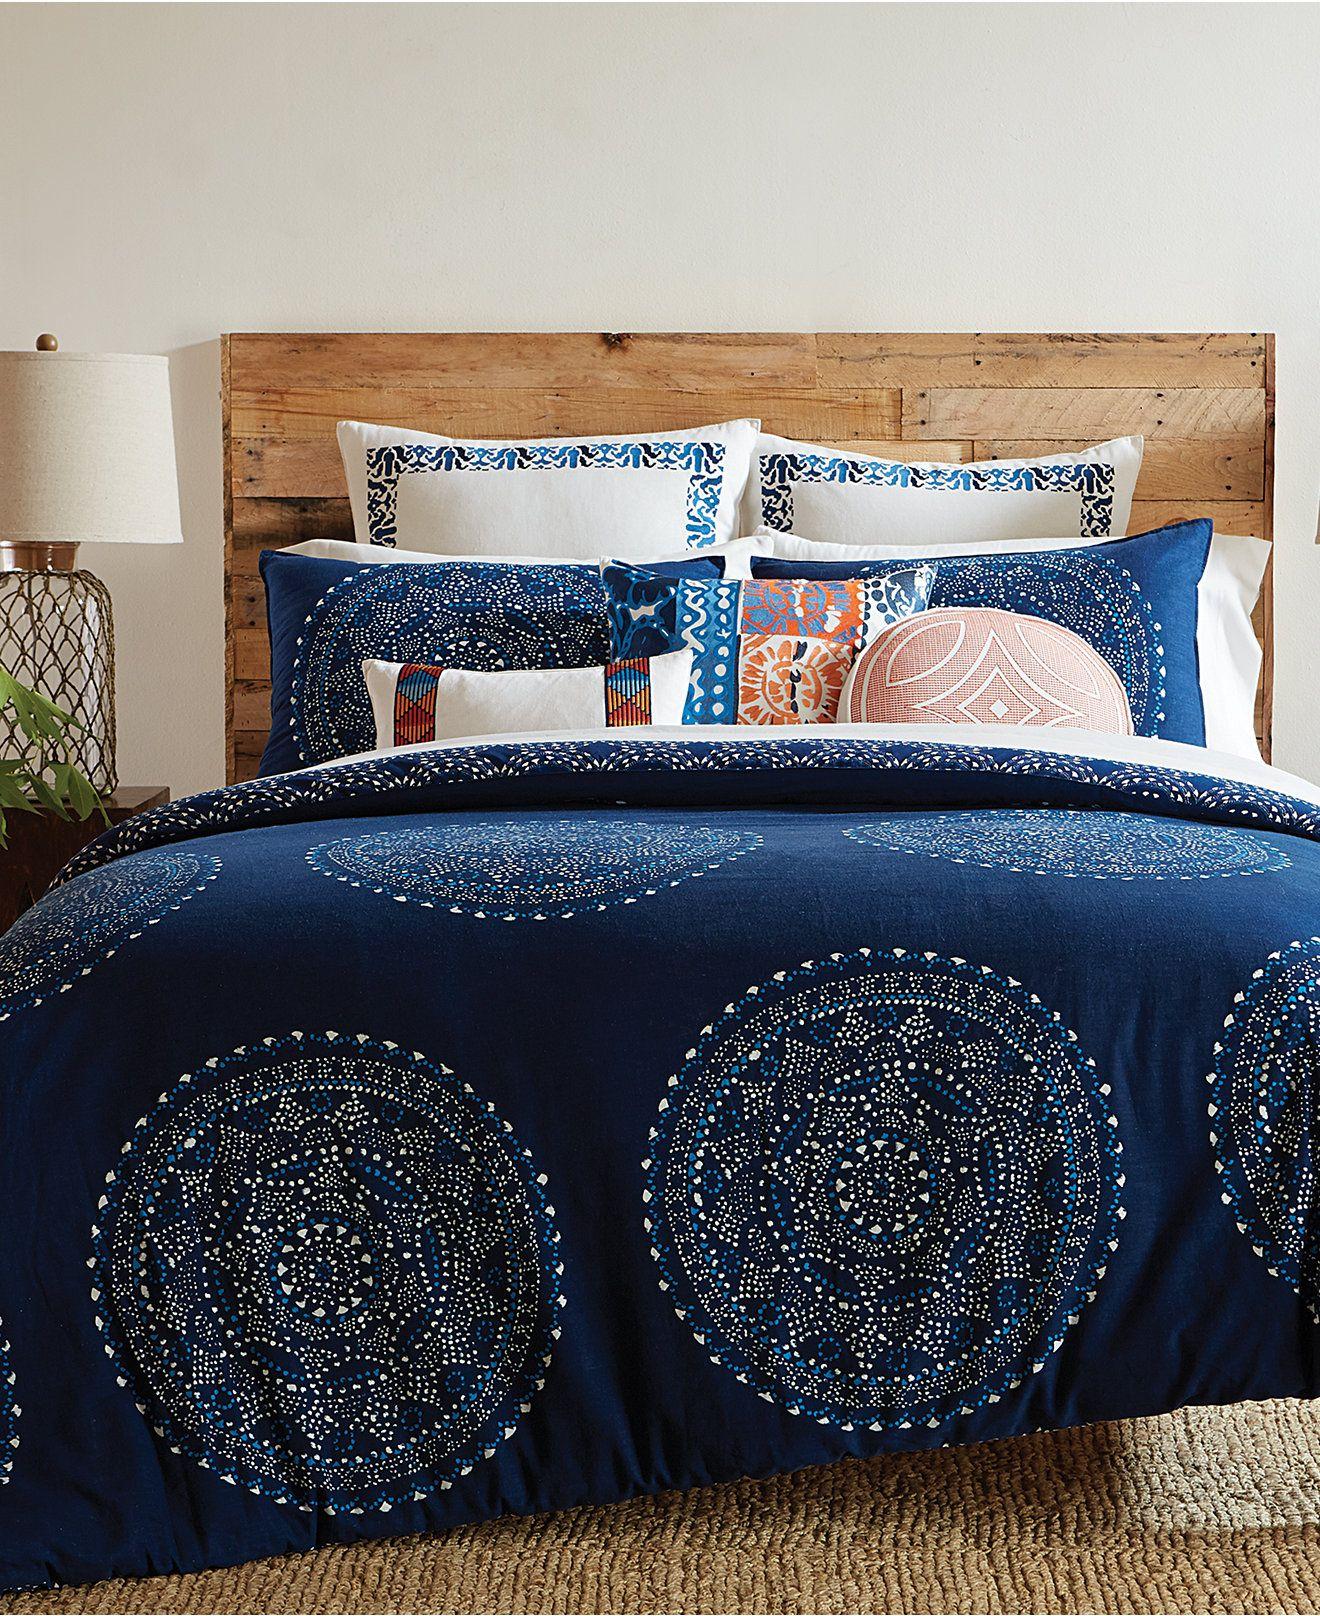 Trina Turk Costa Mesa Medallion Comforter And Duvet Sets Bedding